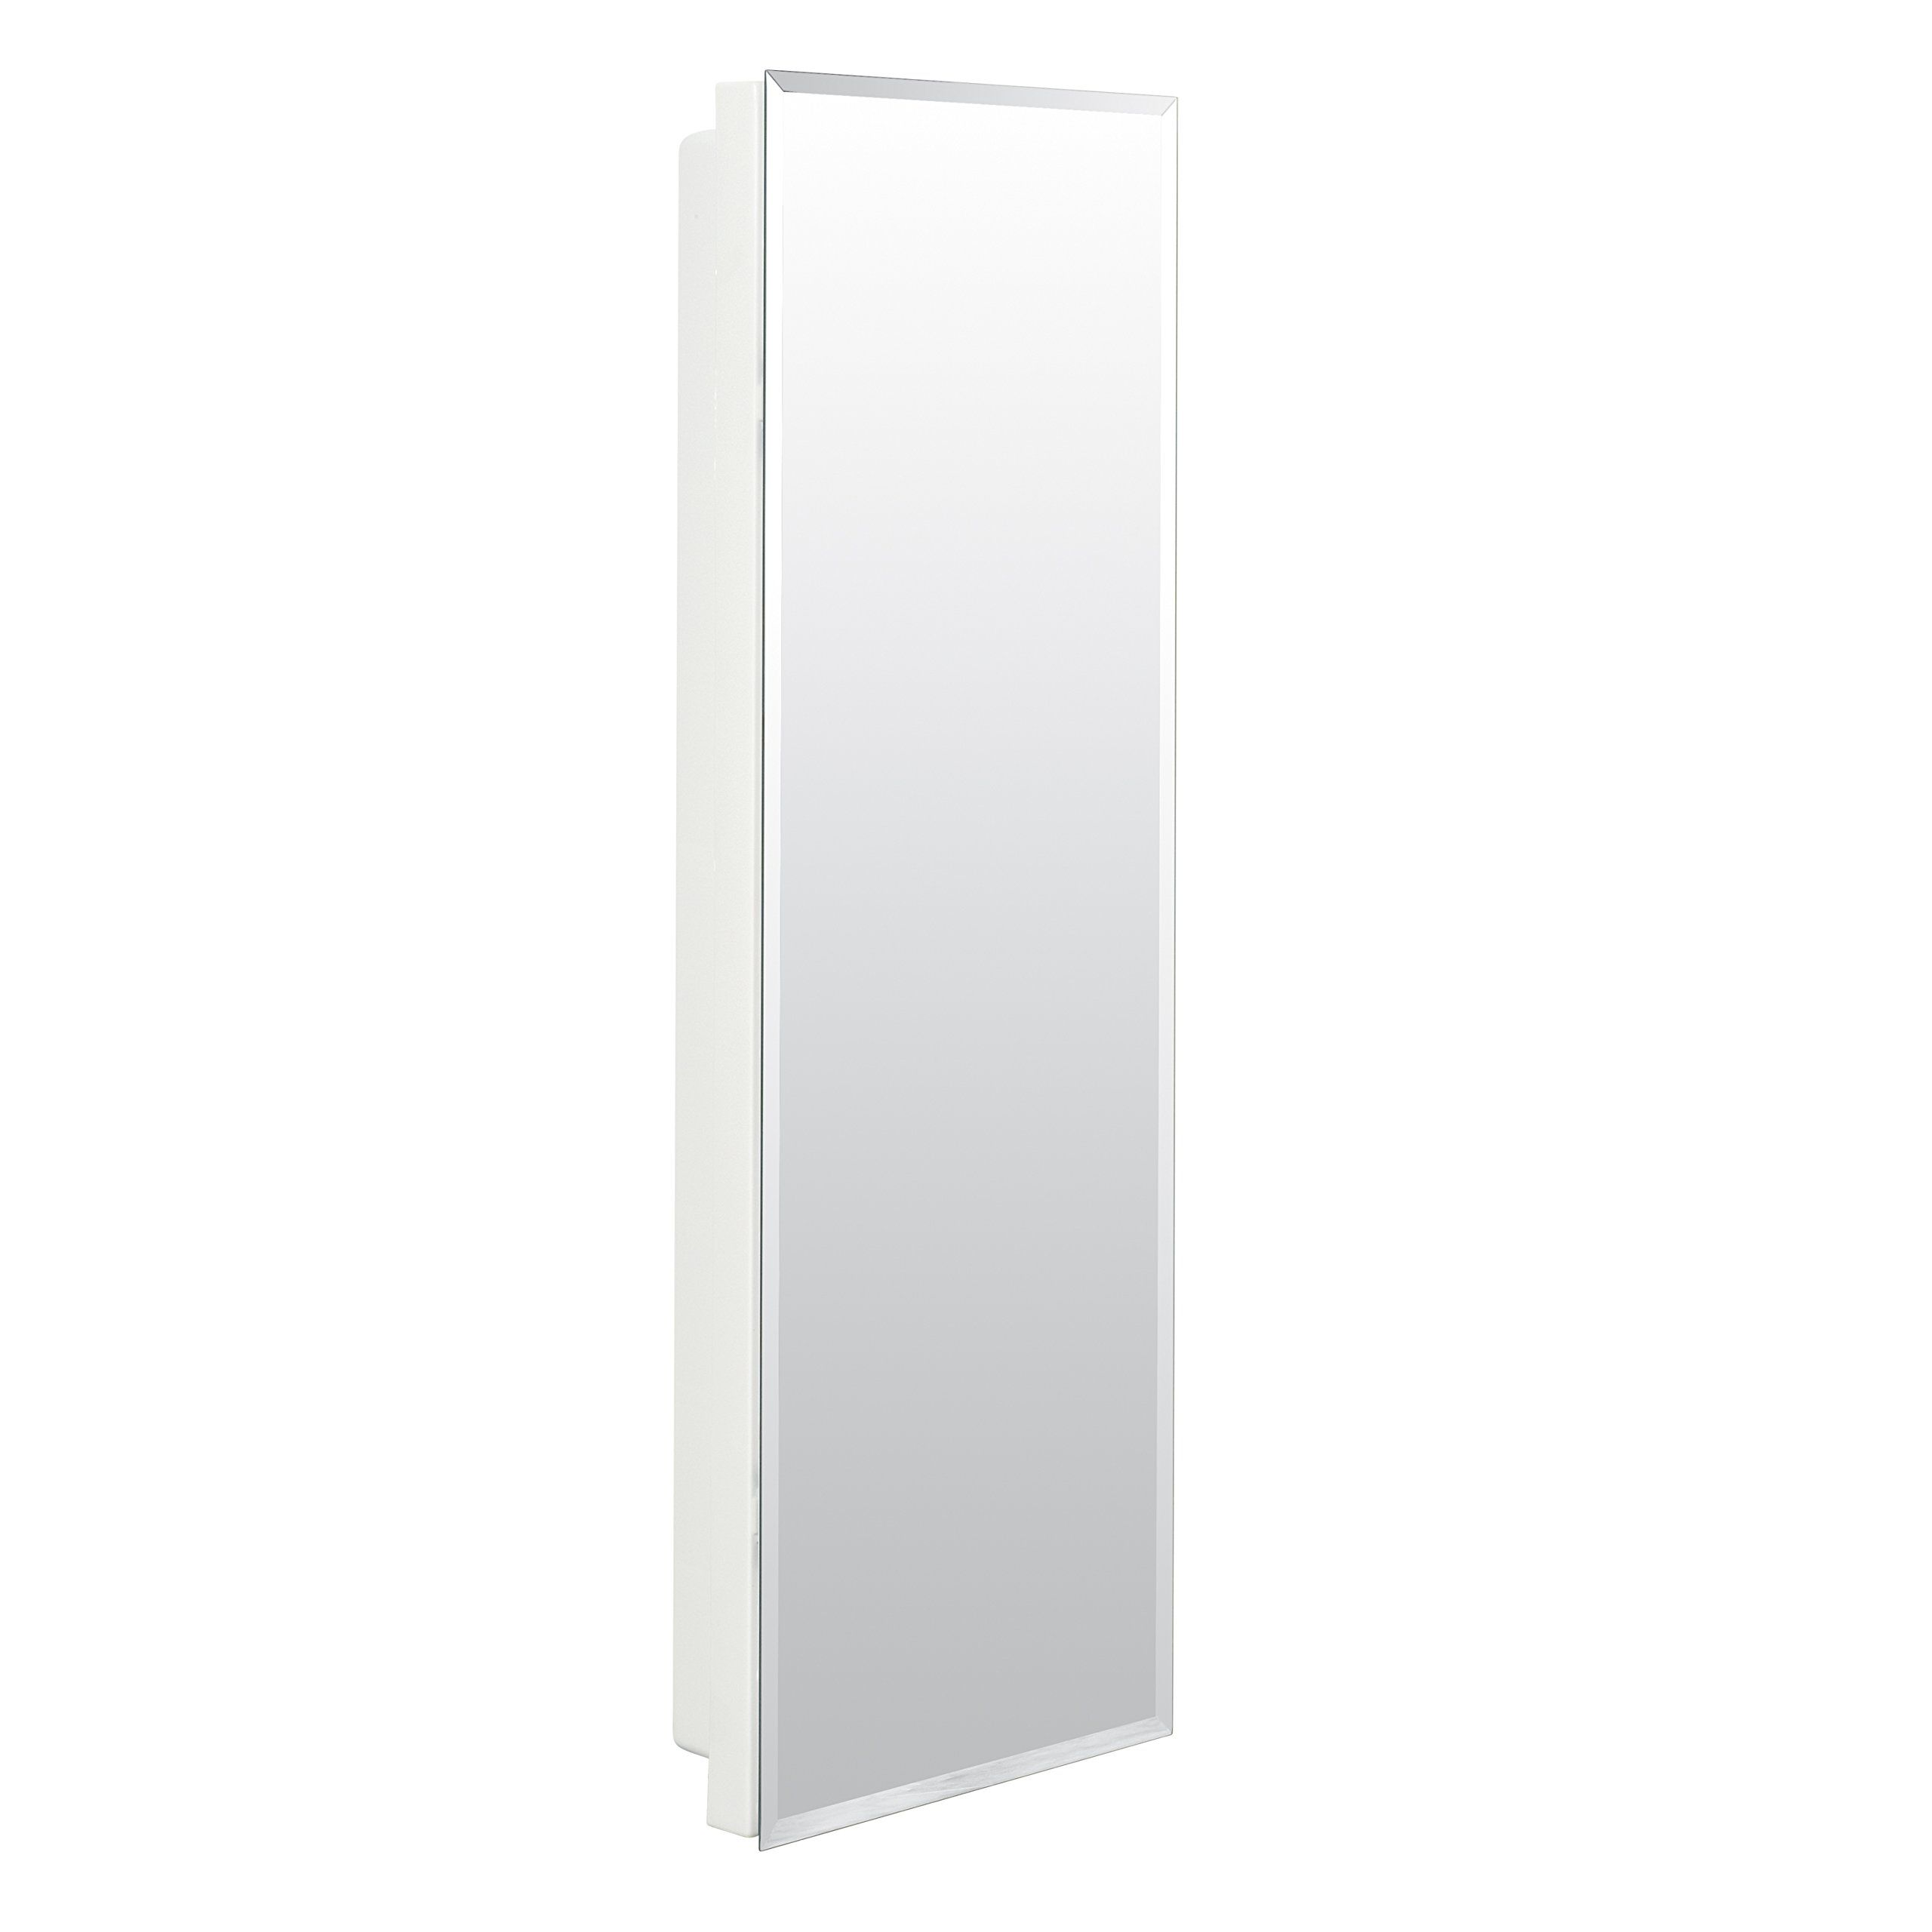 Pin On Bathroom Furniture Decor Ideas